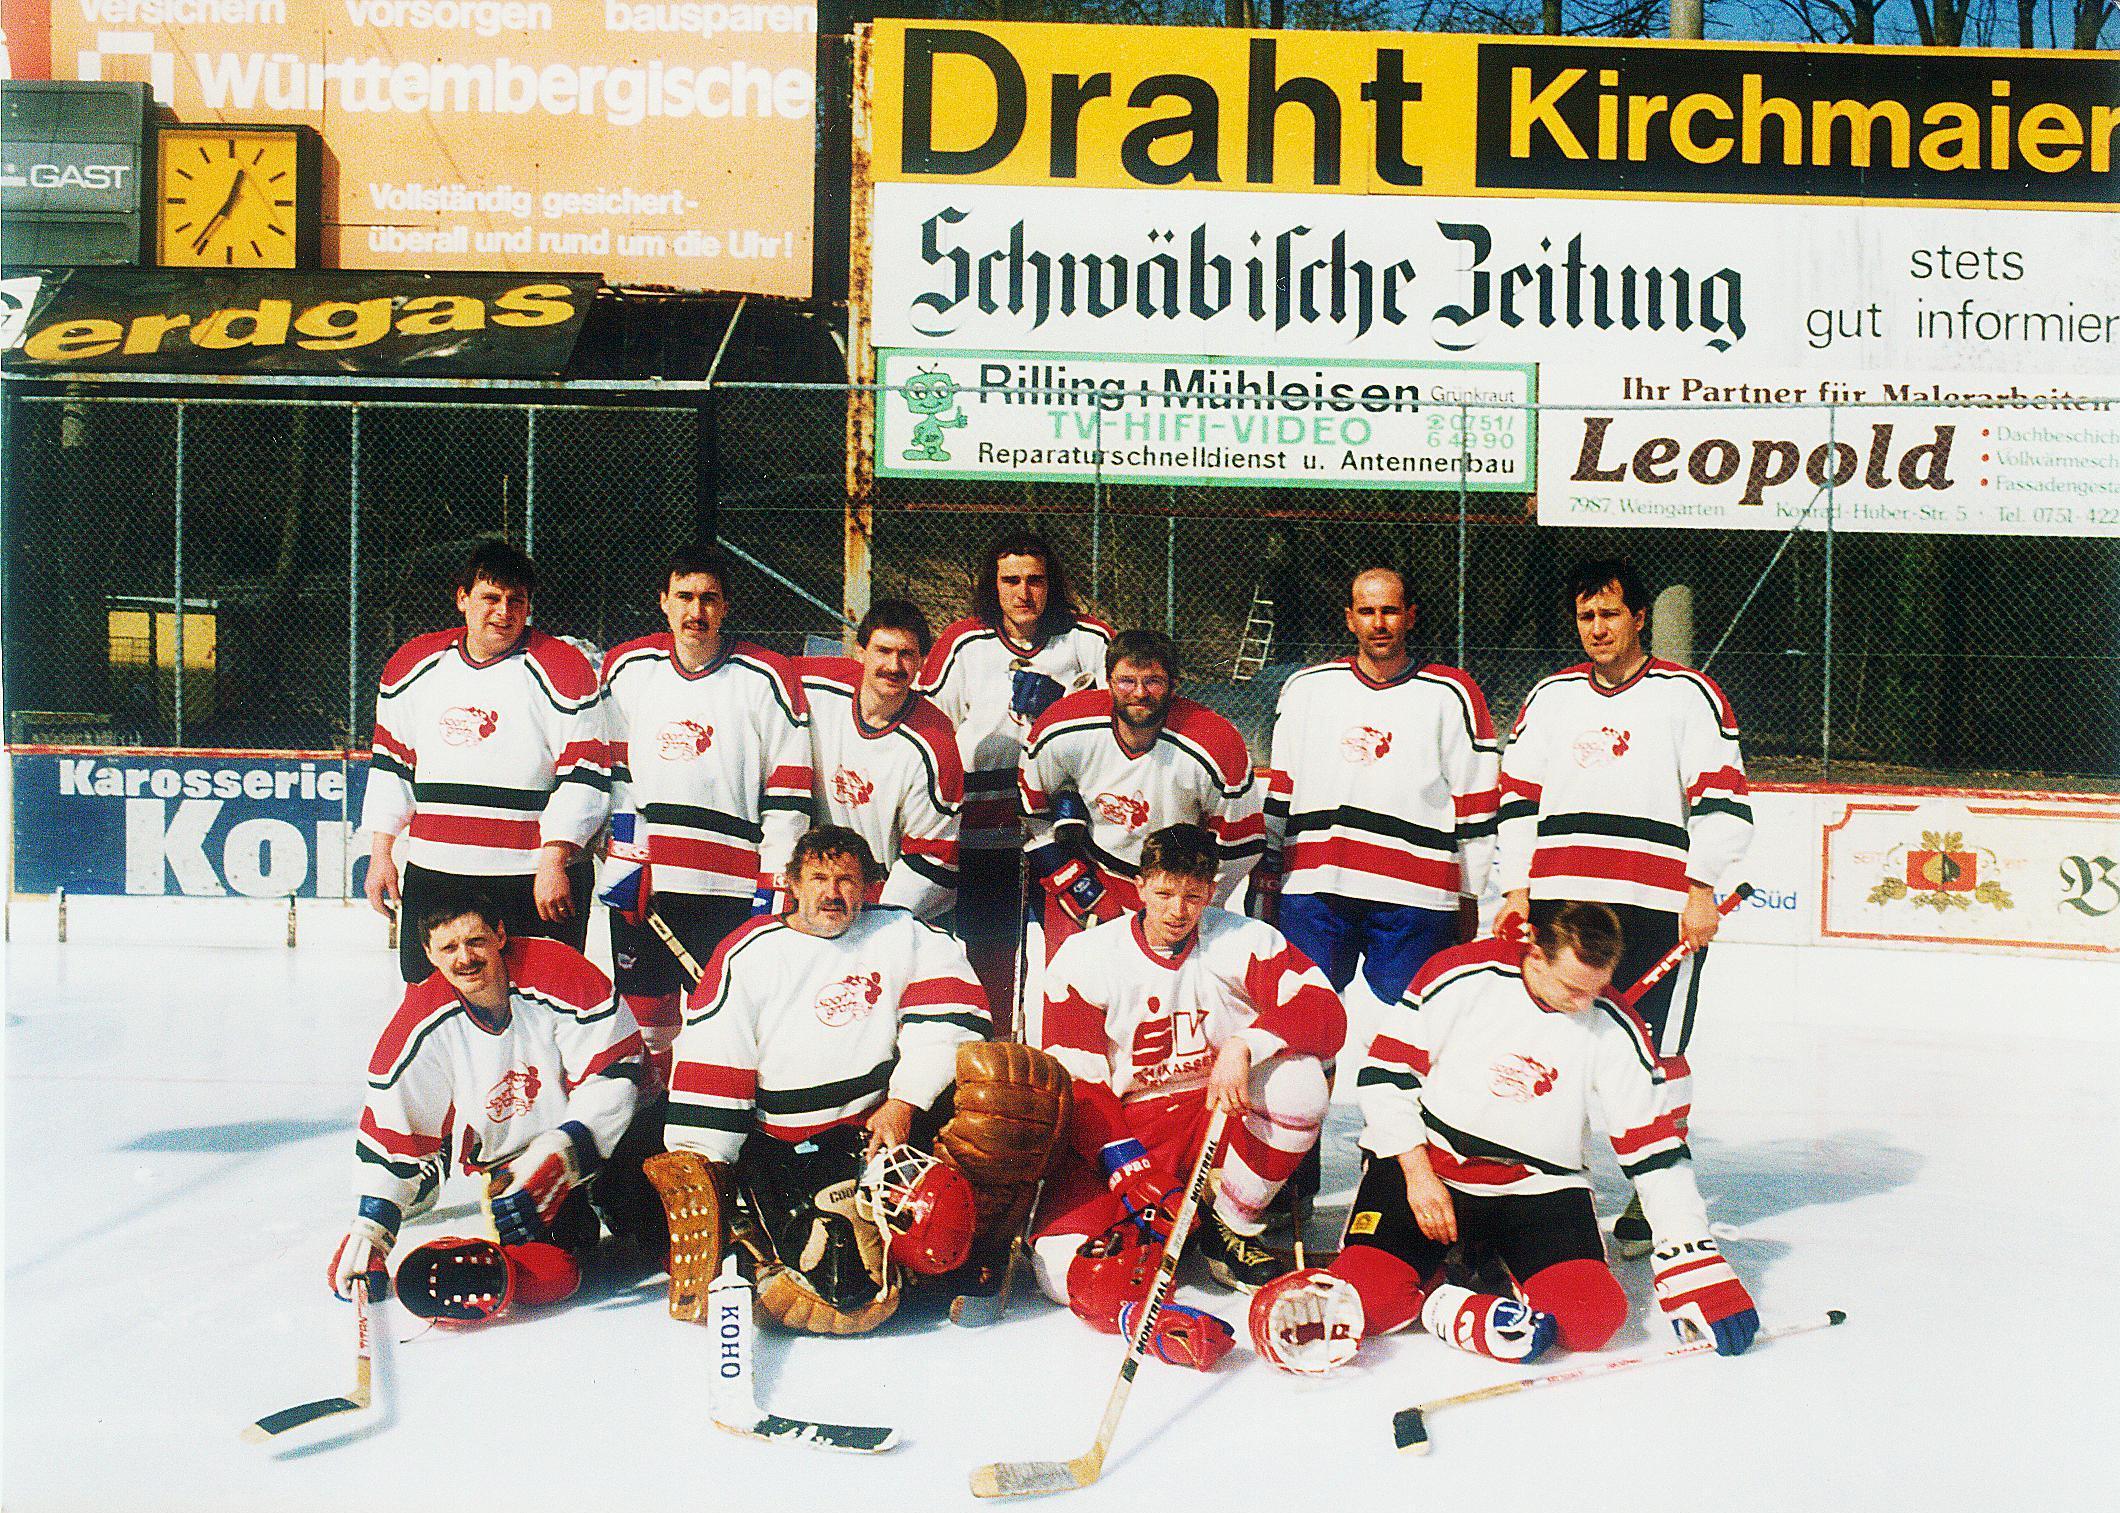 Teamfoto-Sport_Graf